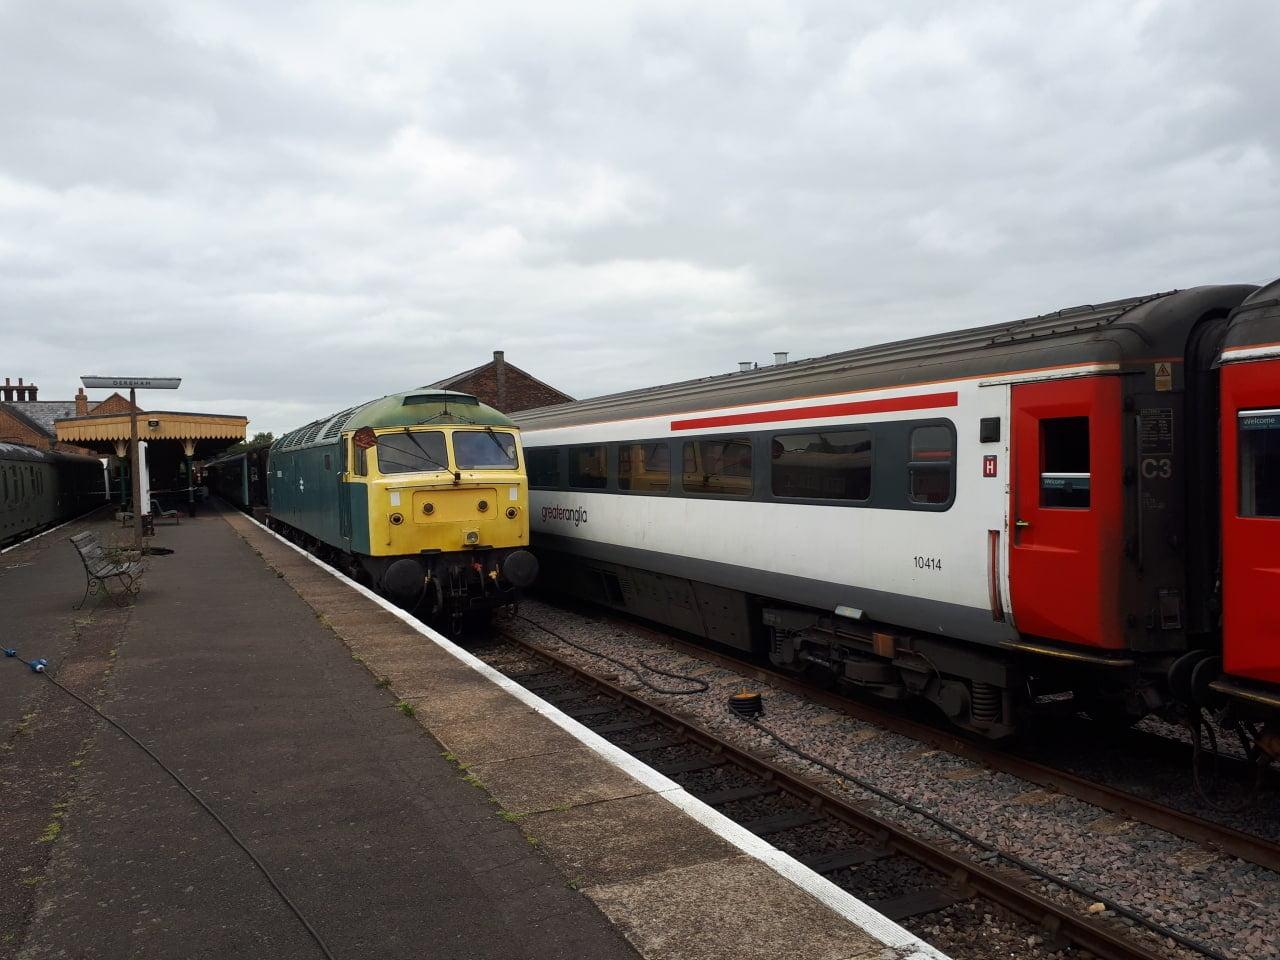 Mid Norfolk Railway applies to run regular train services